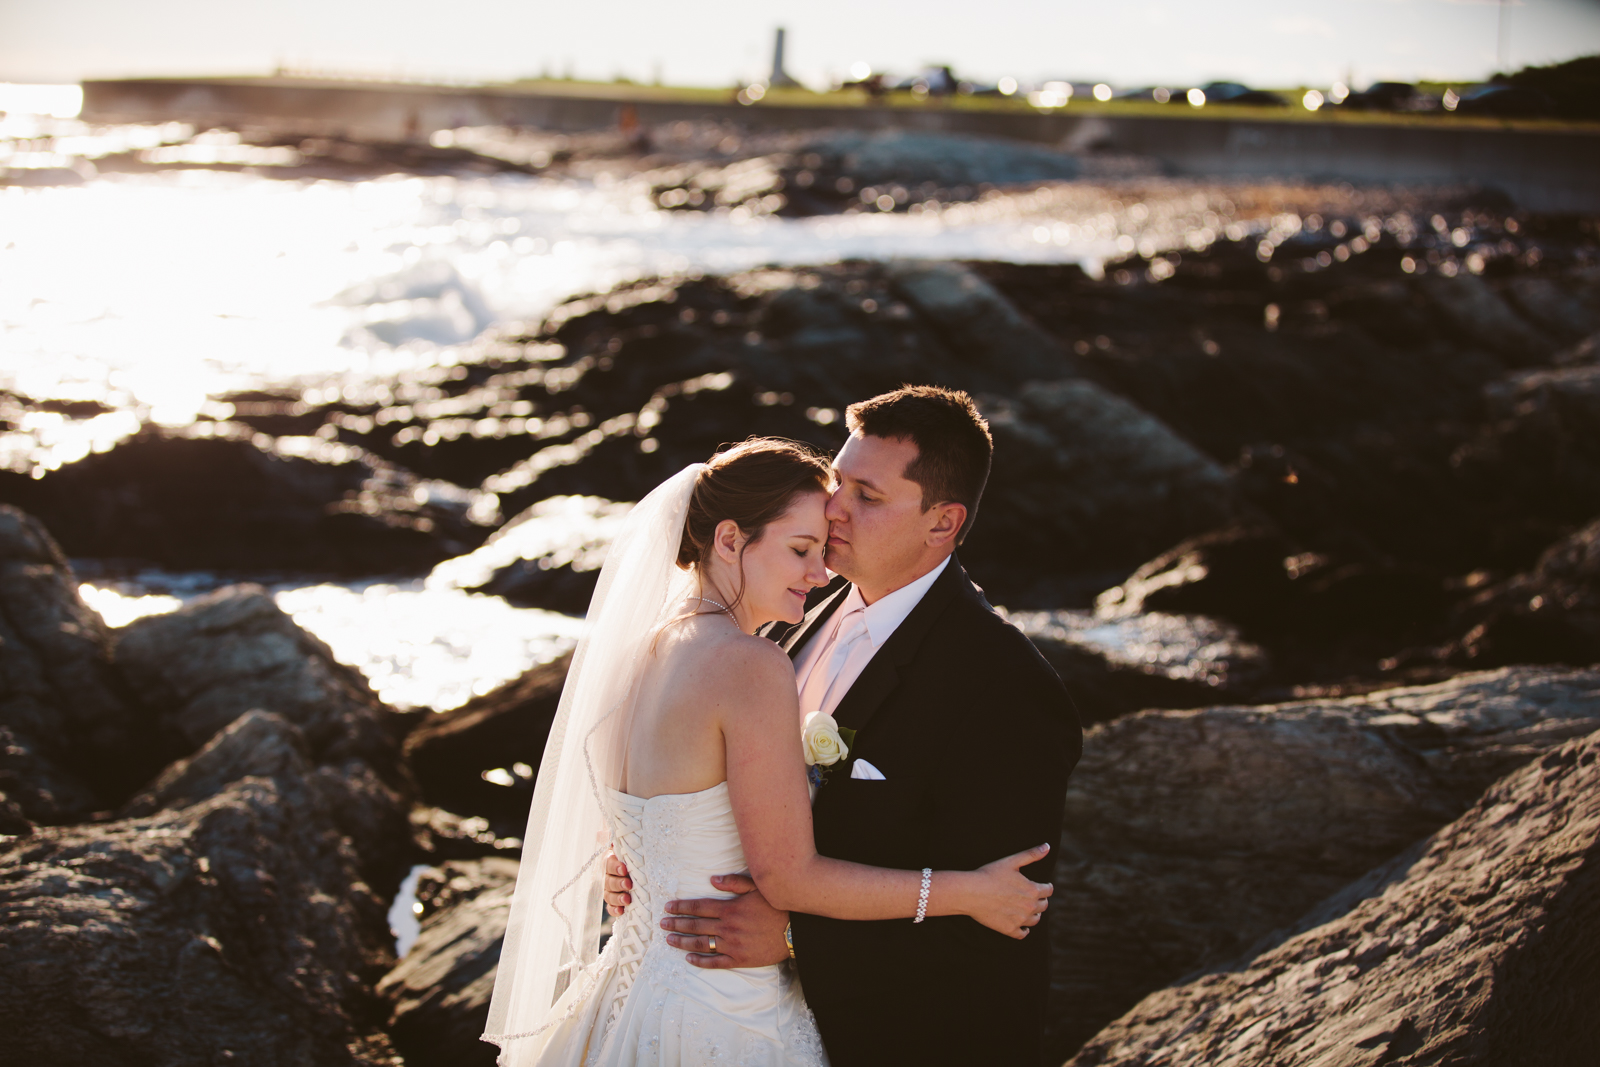 Eastons-Beach-Rotunda-Ballroom-Wedding-Newport-Rhode-Island-PhotographybyAmandaMorgan-72.jpg